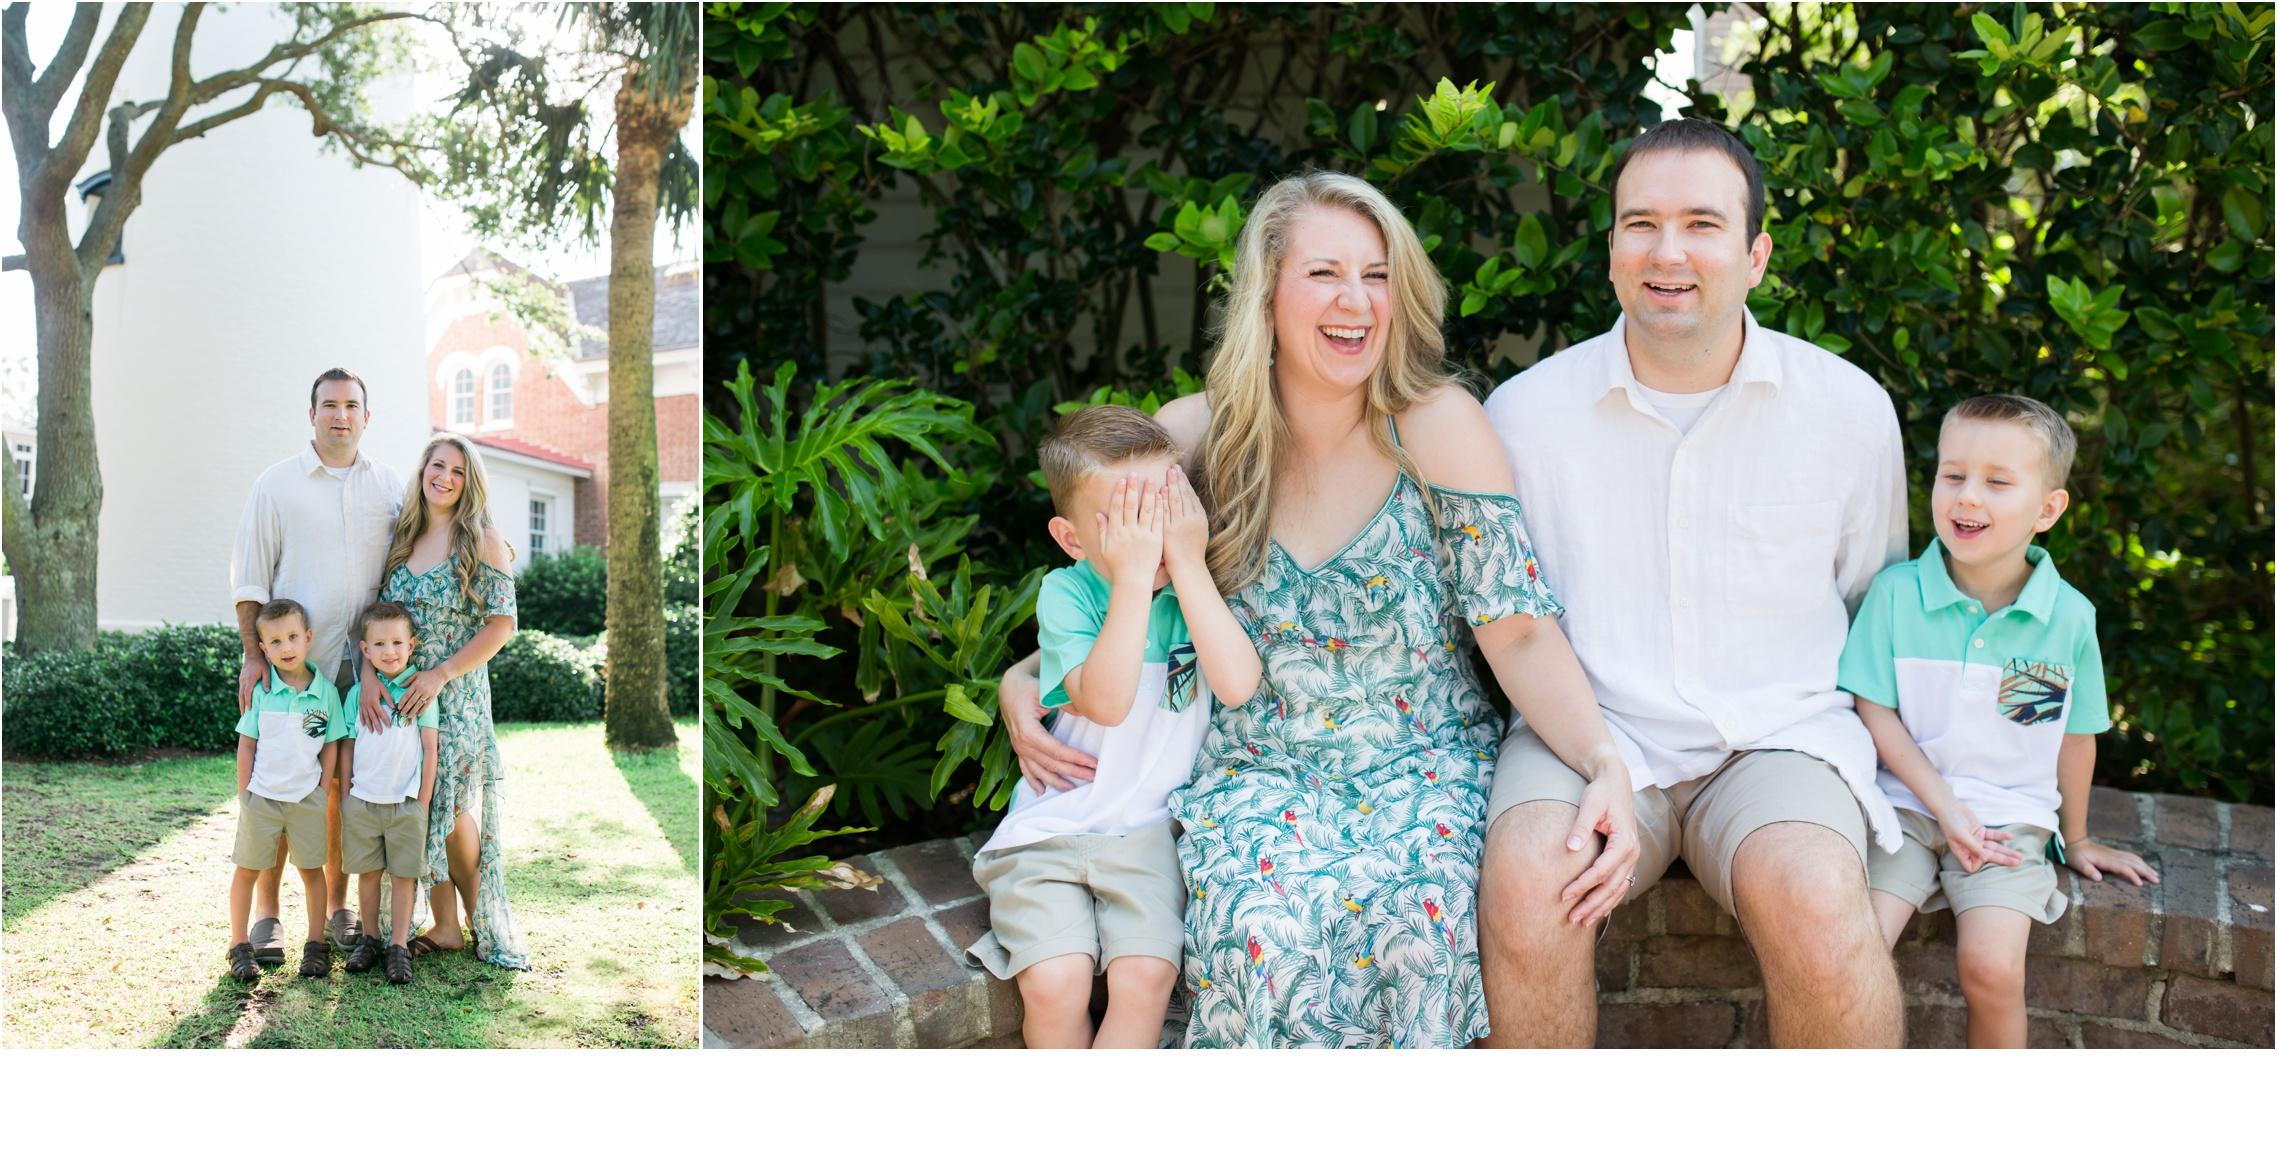 Rainey_Gregg_Photography_St._Simons_Island_Georgia_California_Wedding_Portrait_Photography_0129.jpg